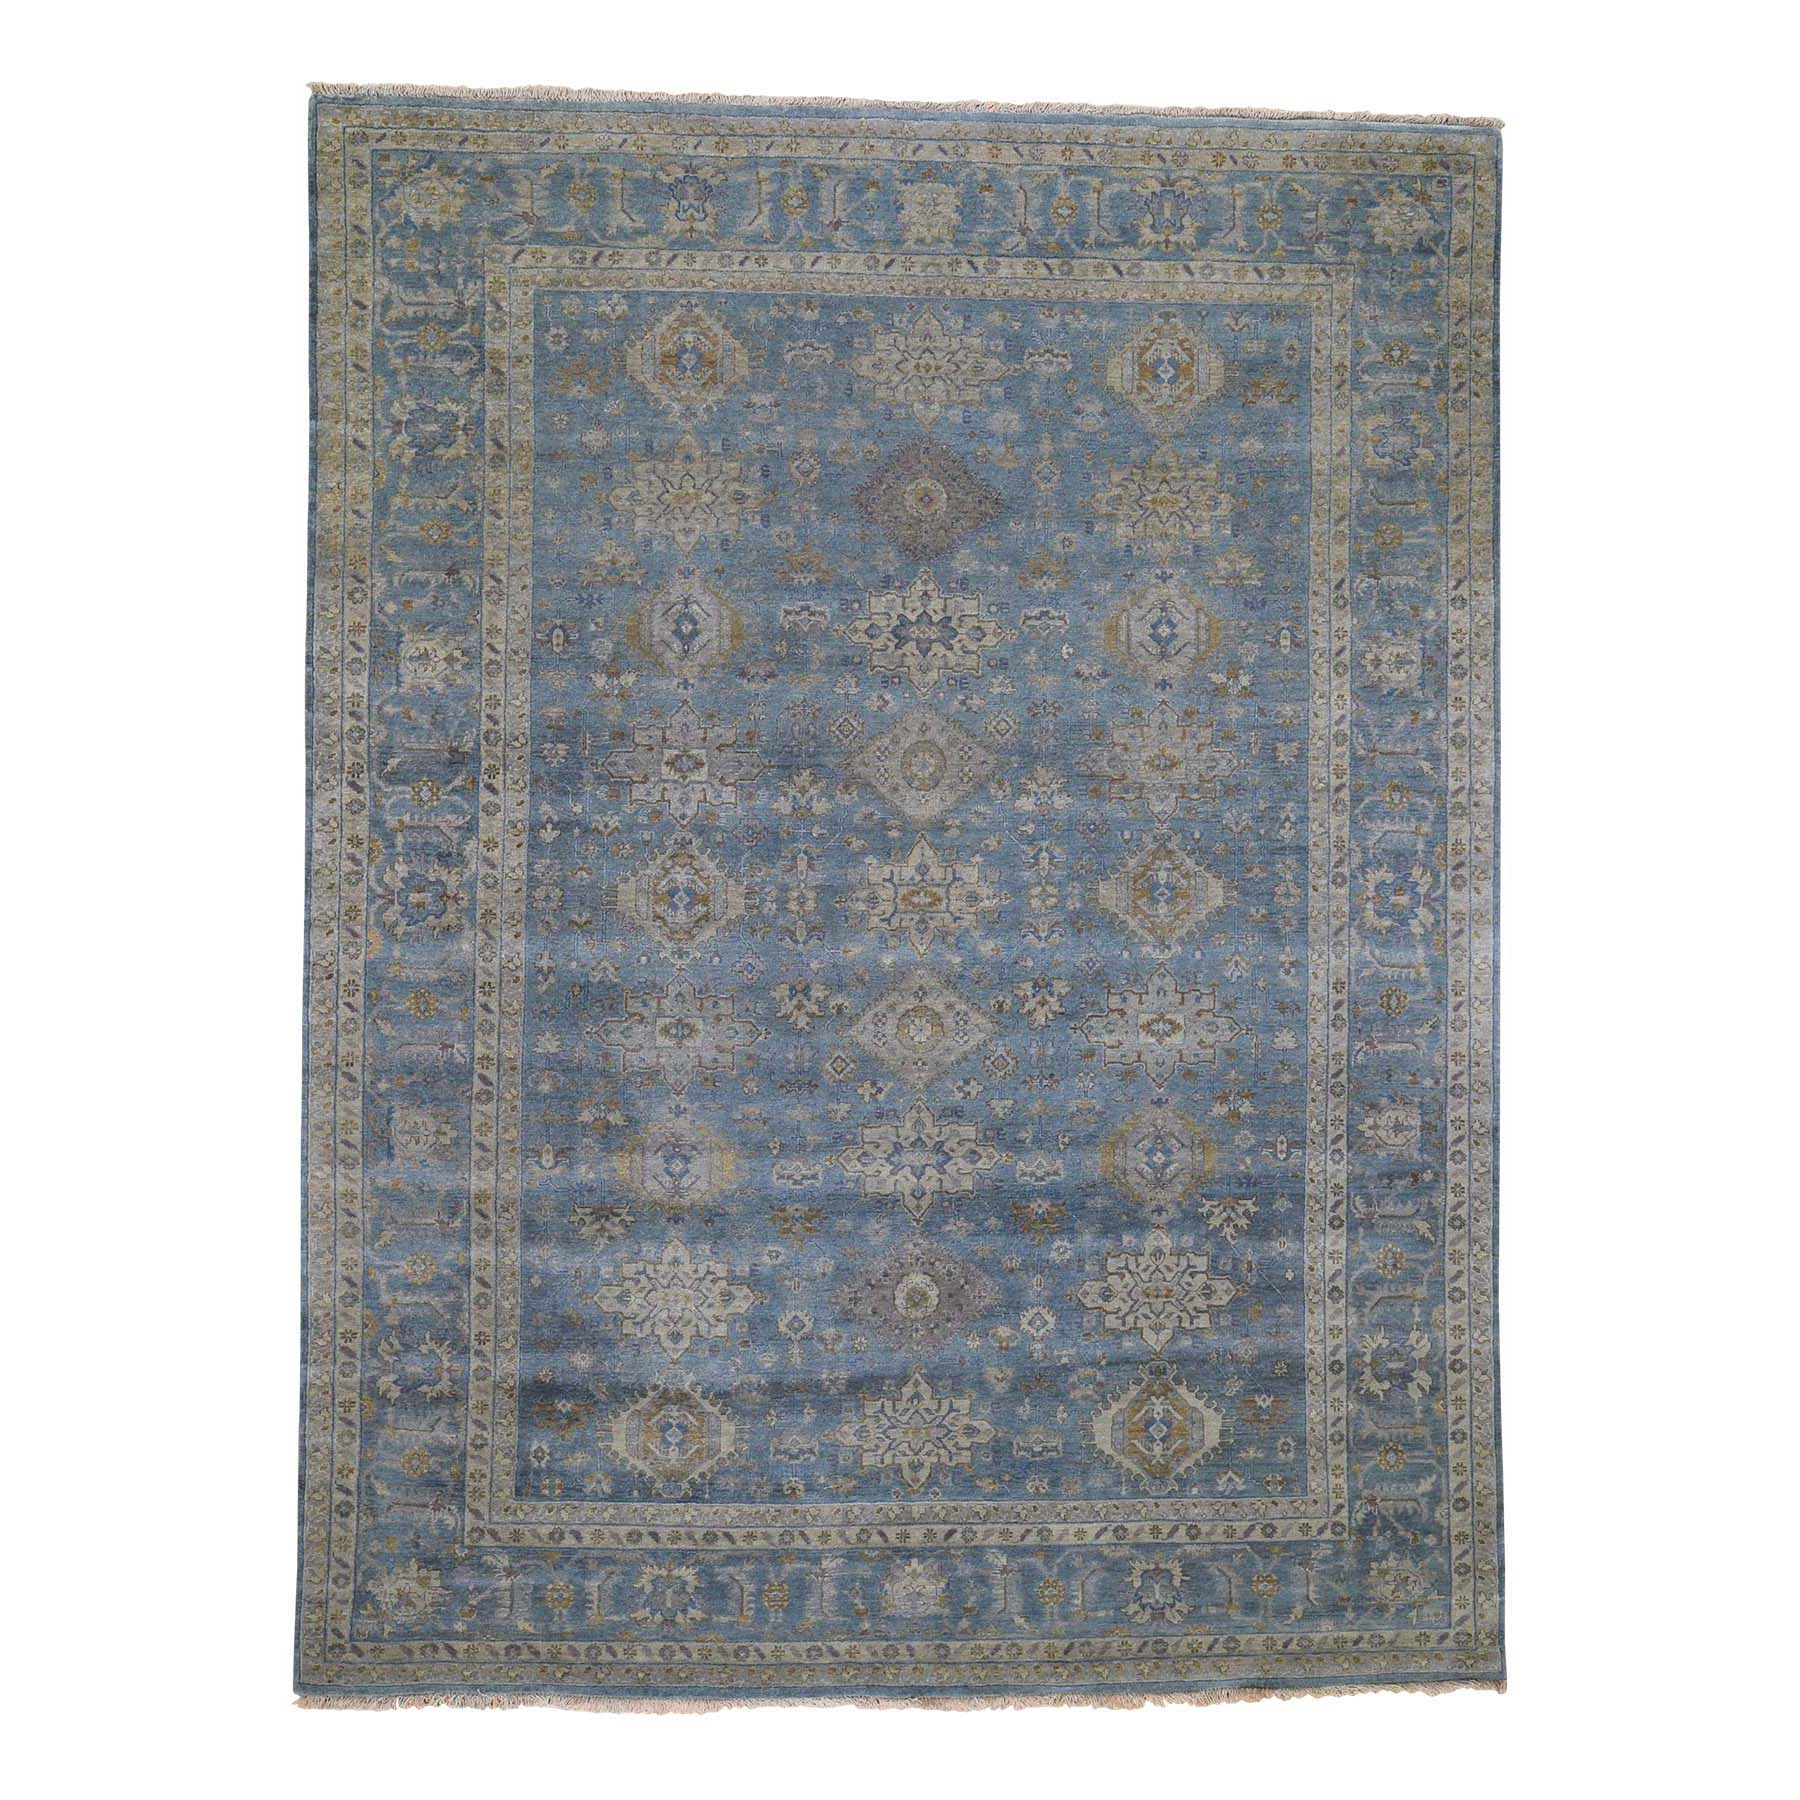 9'X12' Blue Karajeh Design Pure Wool Hand-Knotted Oriental Rug moadeea6